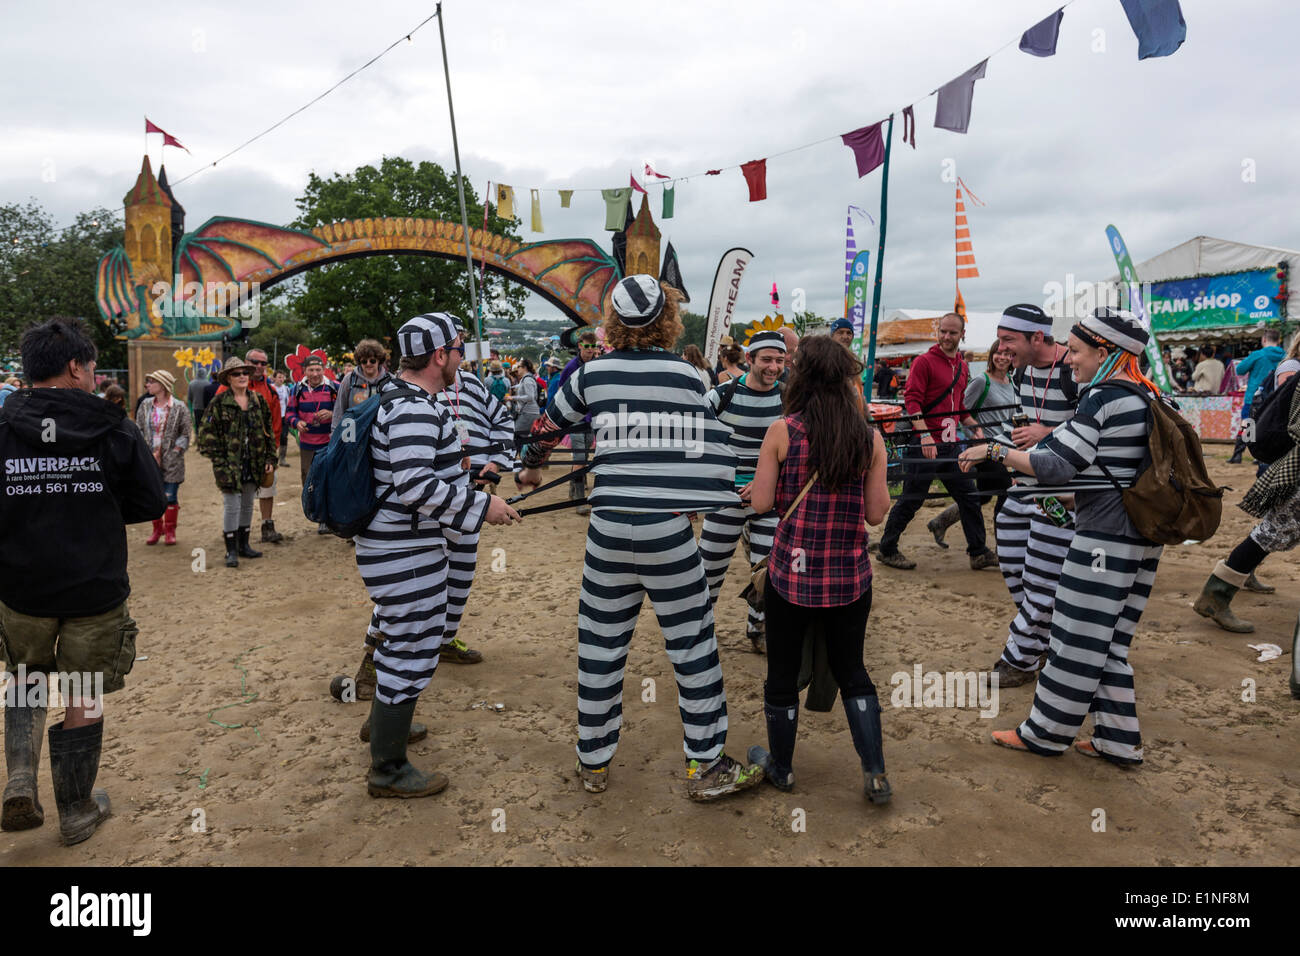 Funny people dressed as prisoners  Glastonbury Festival 2013 - Stock Image